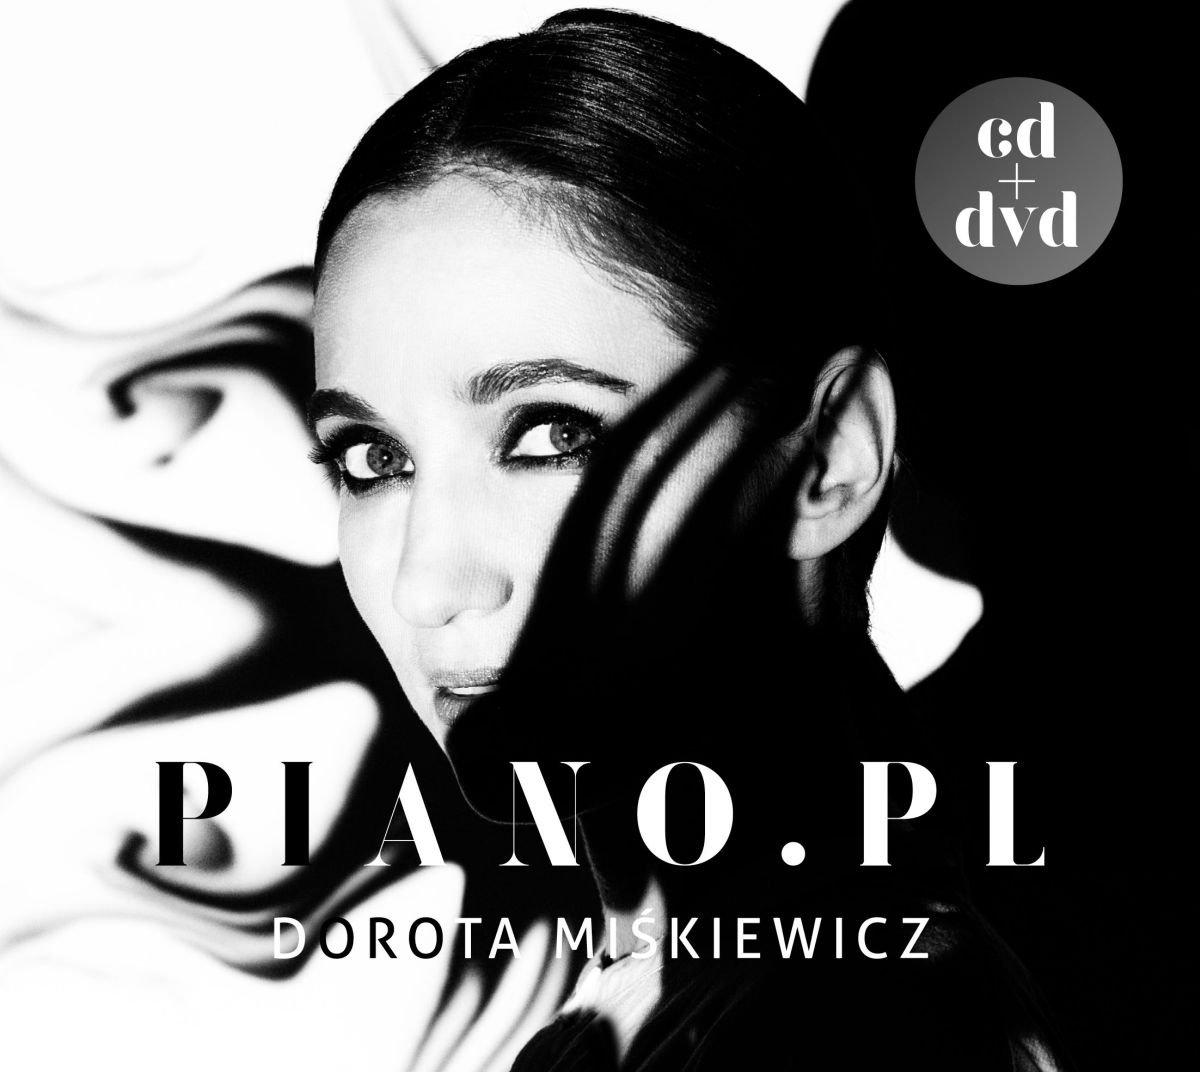 Dorota Miskiewicz: Piano.Pl (CD+DVD) 【予約受付中】